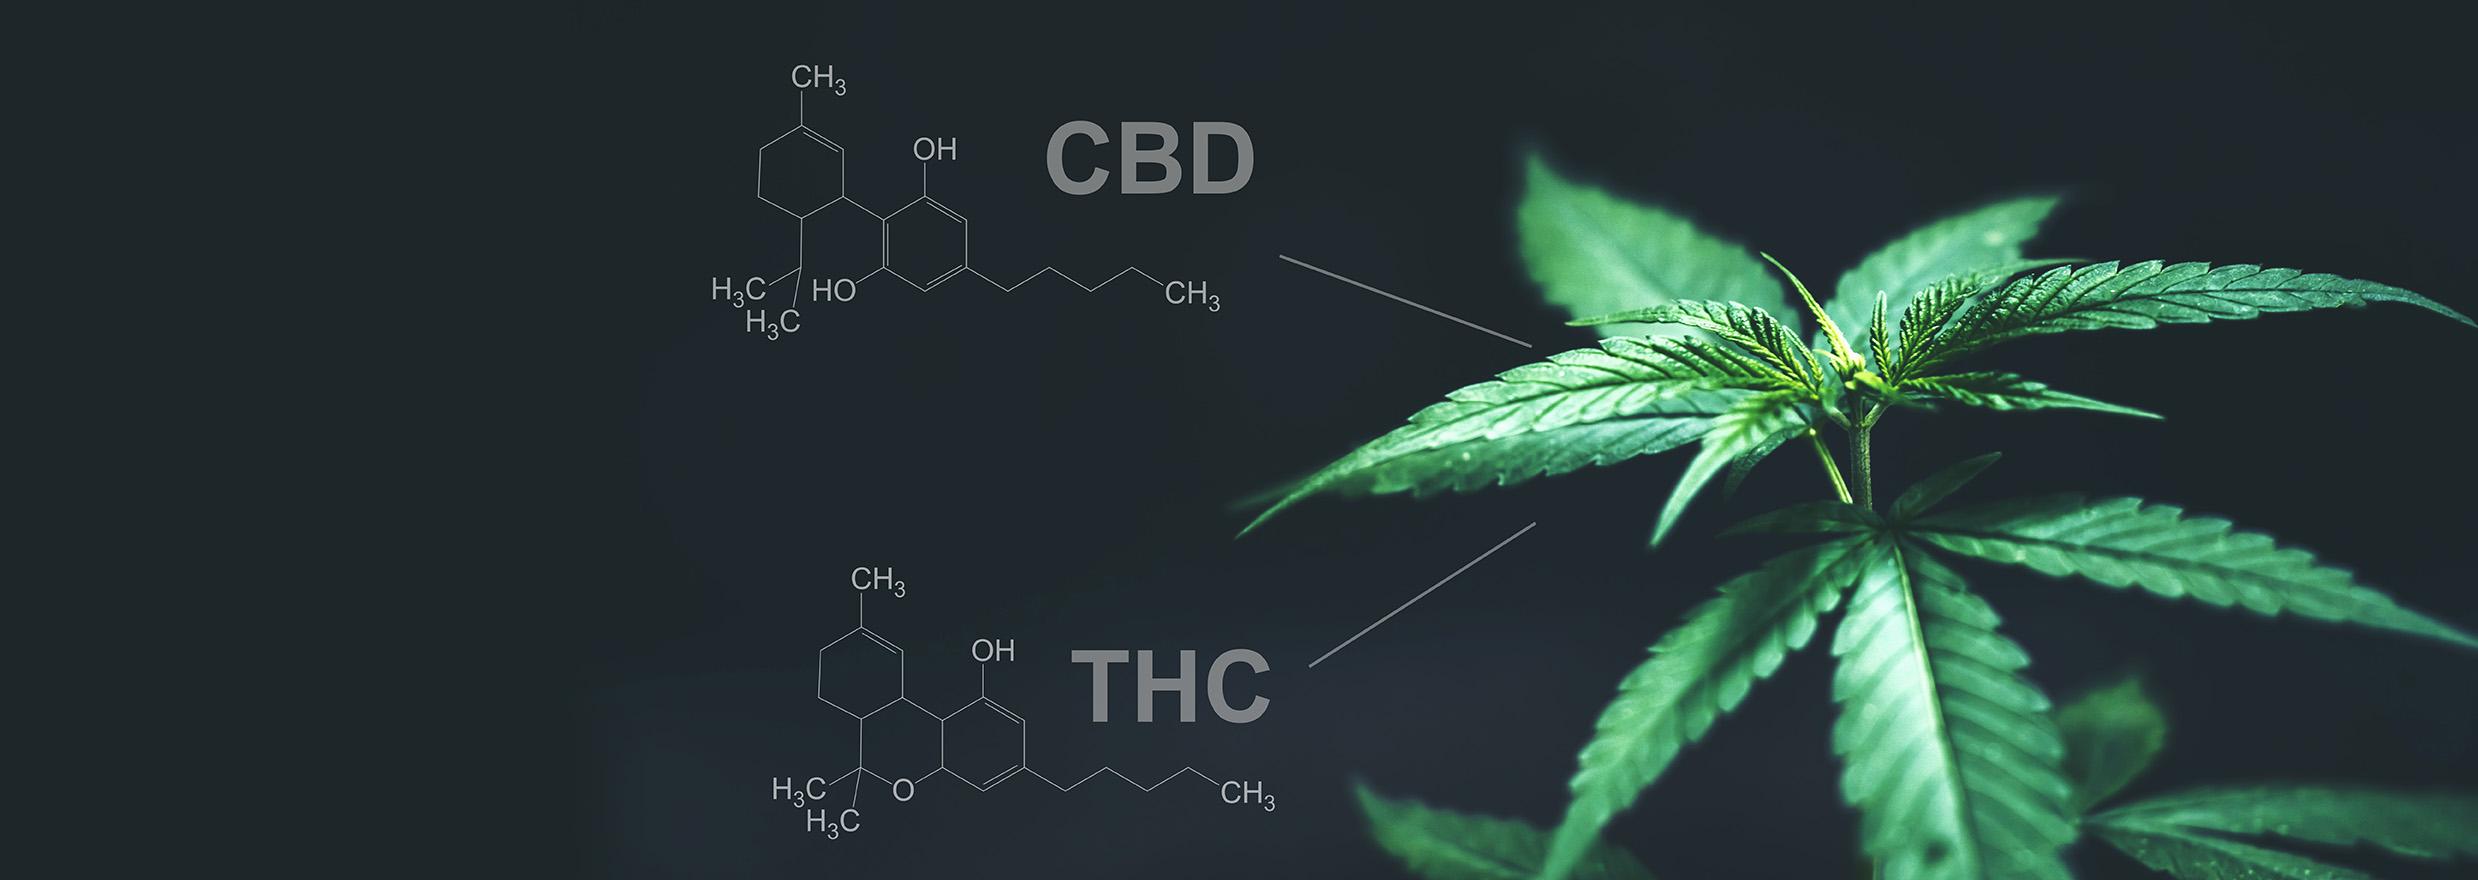 THC or CBD